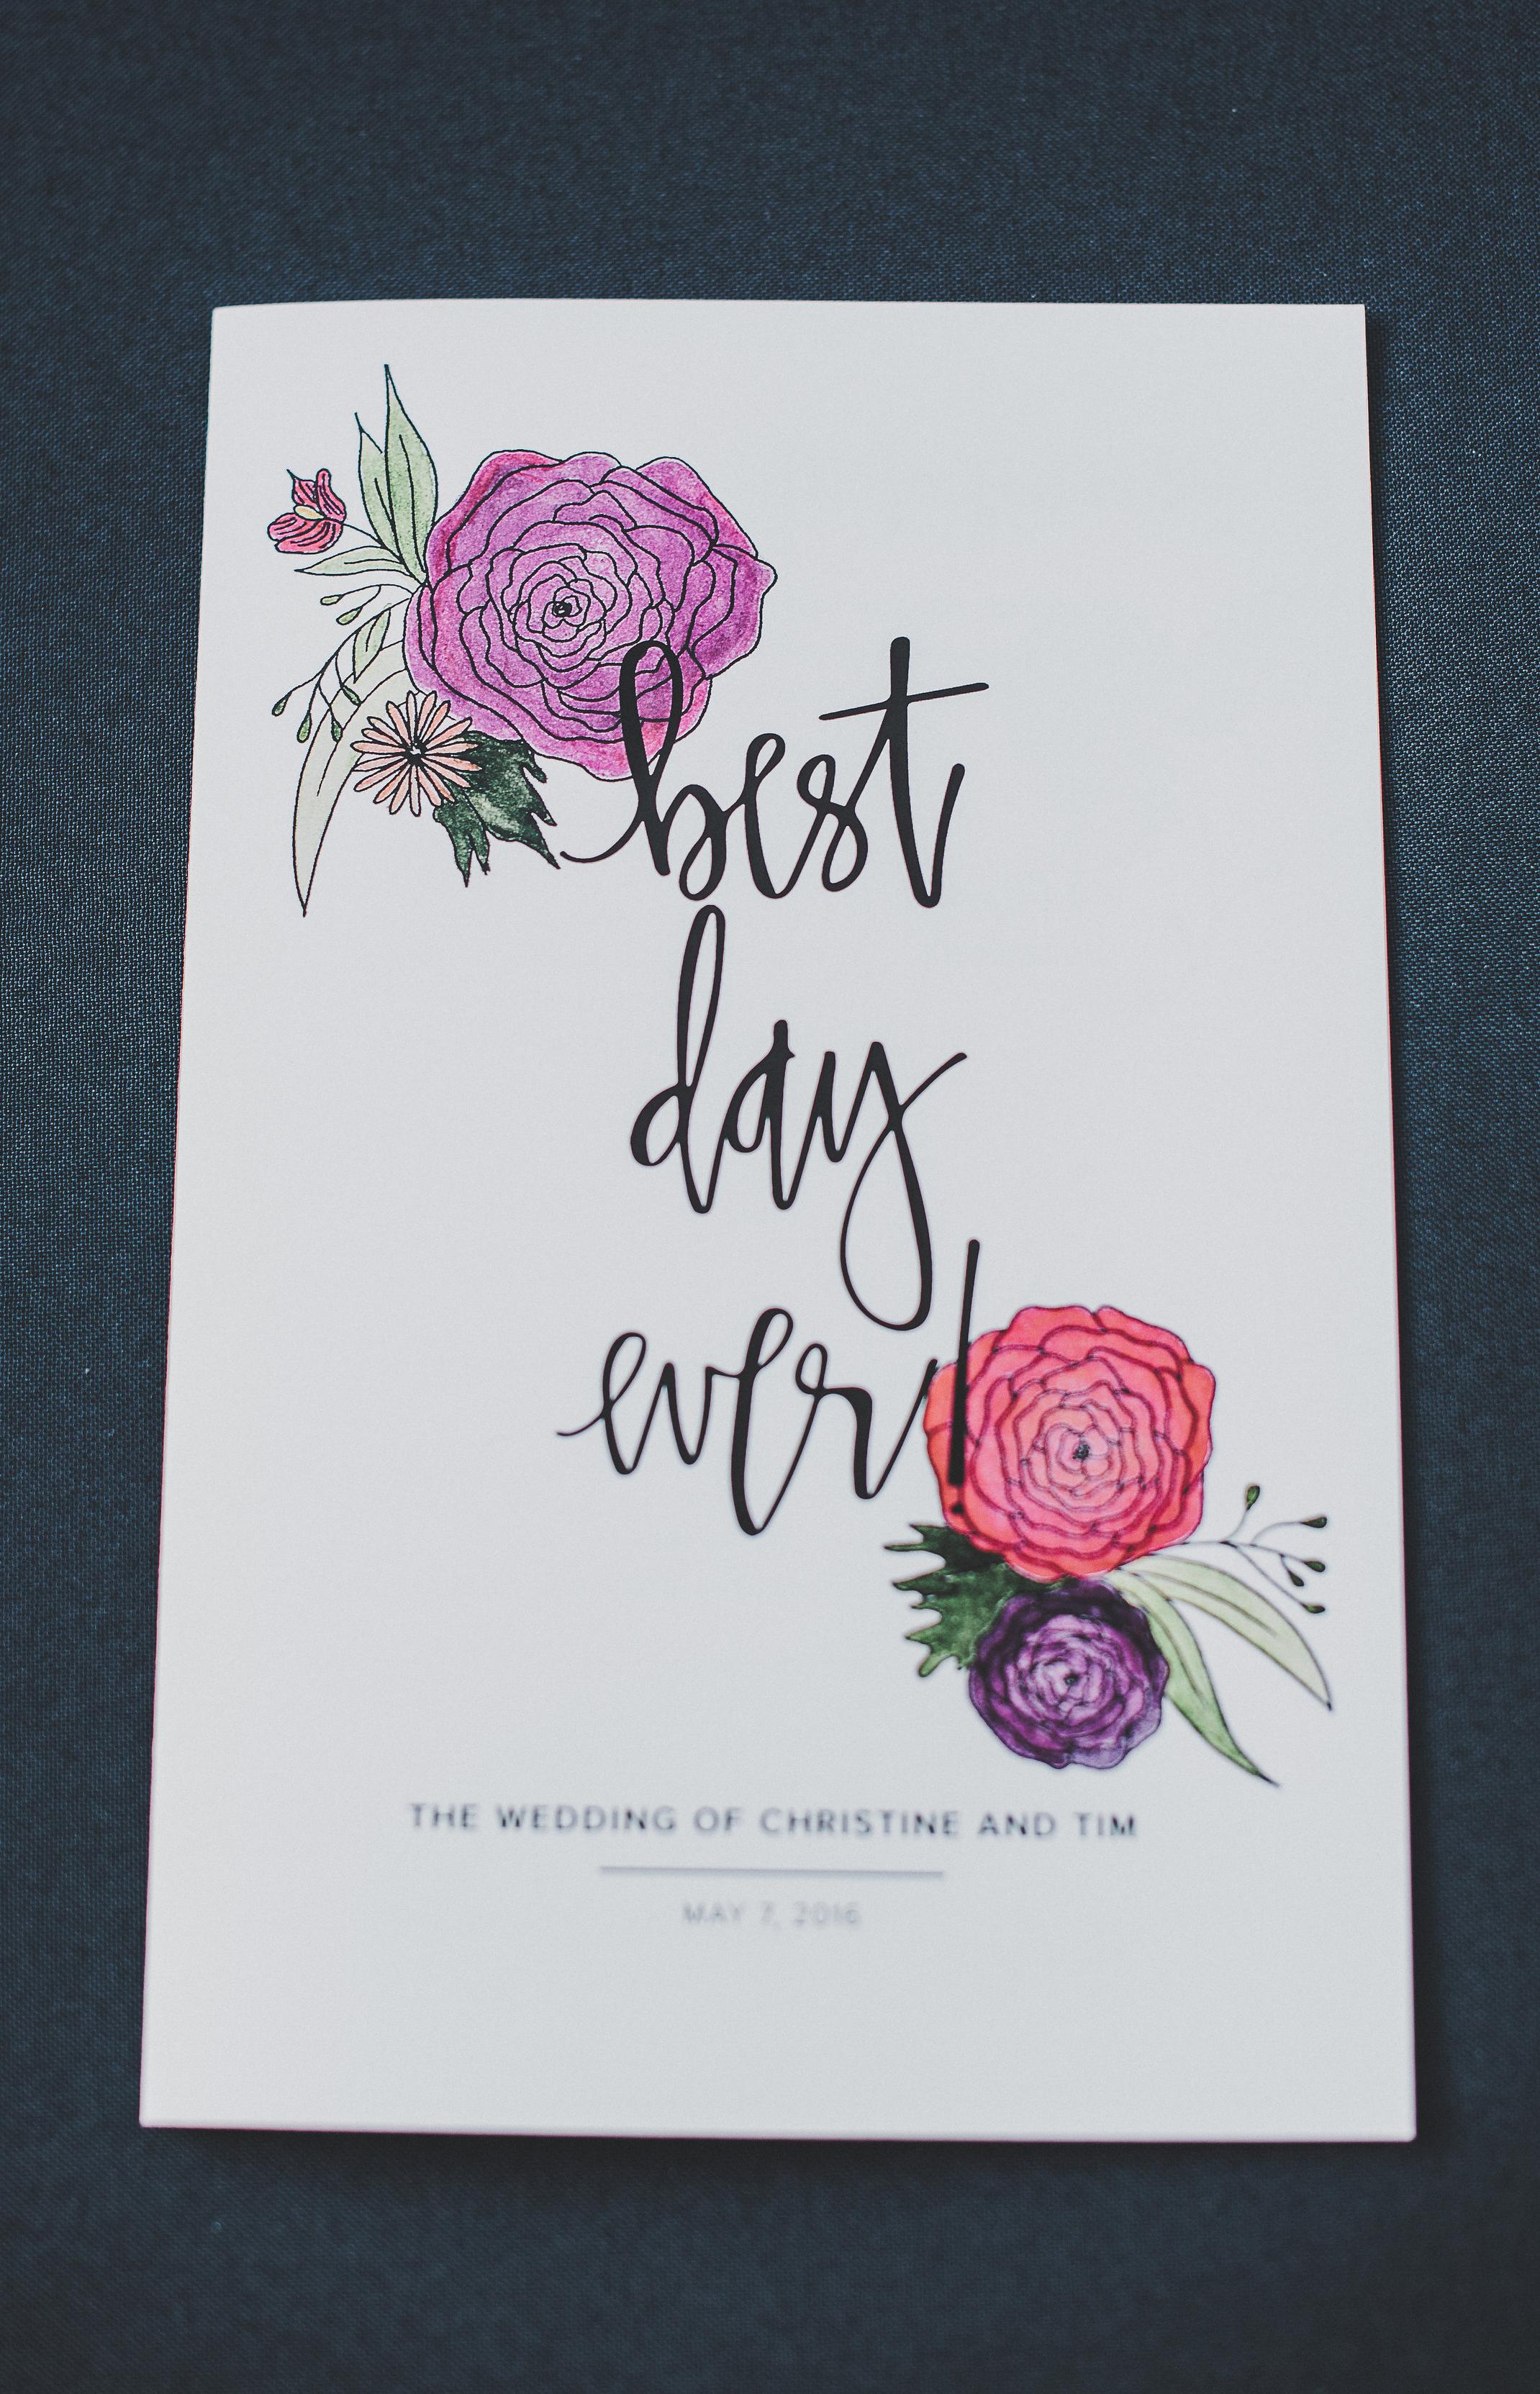 Tim & Christy's Wedding